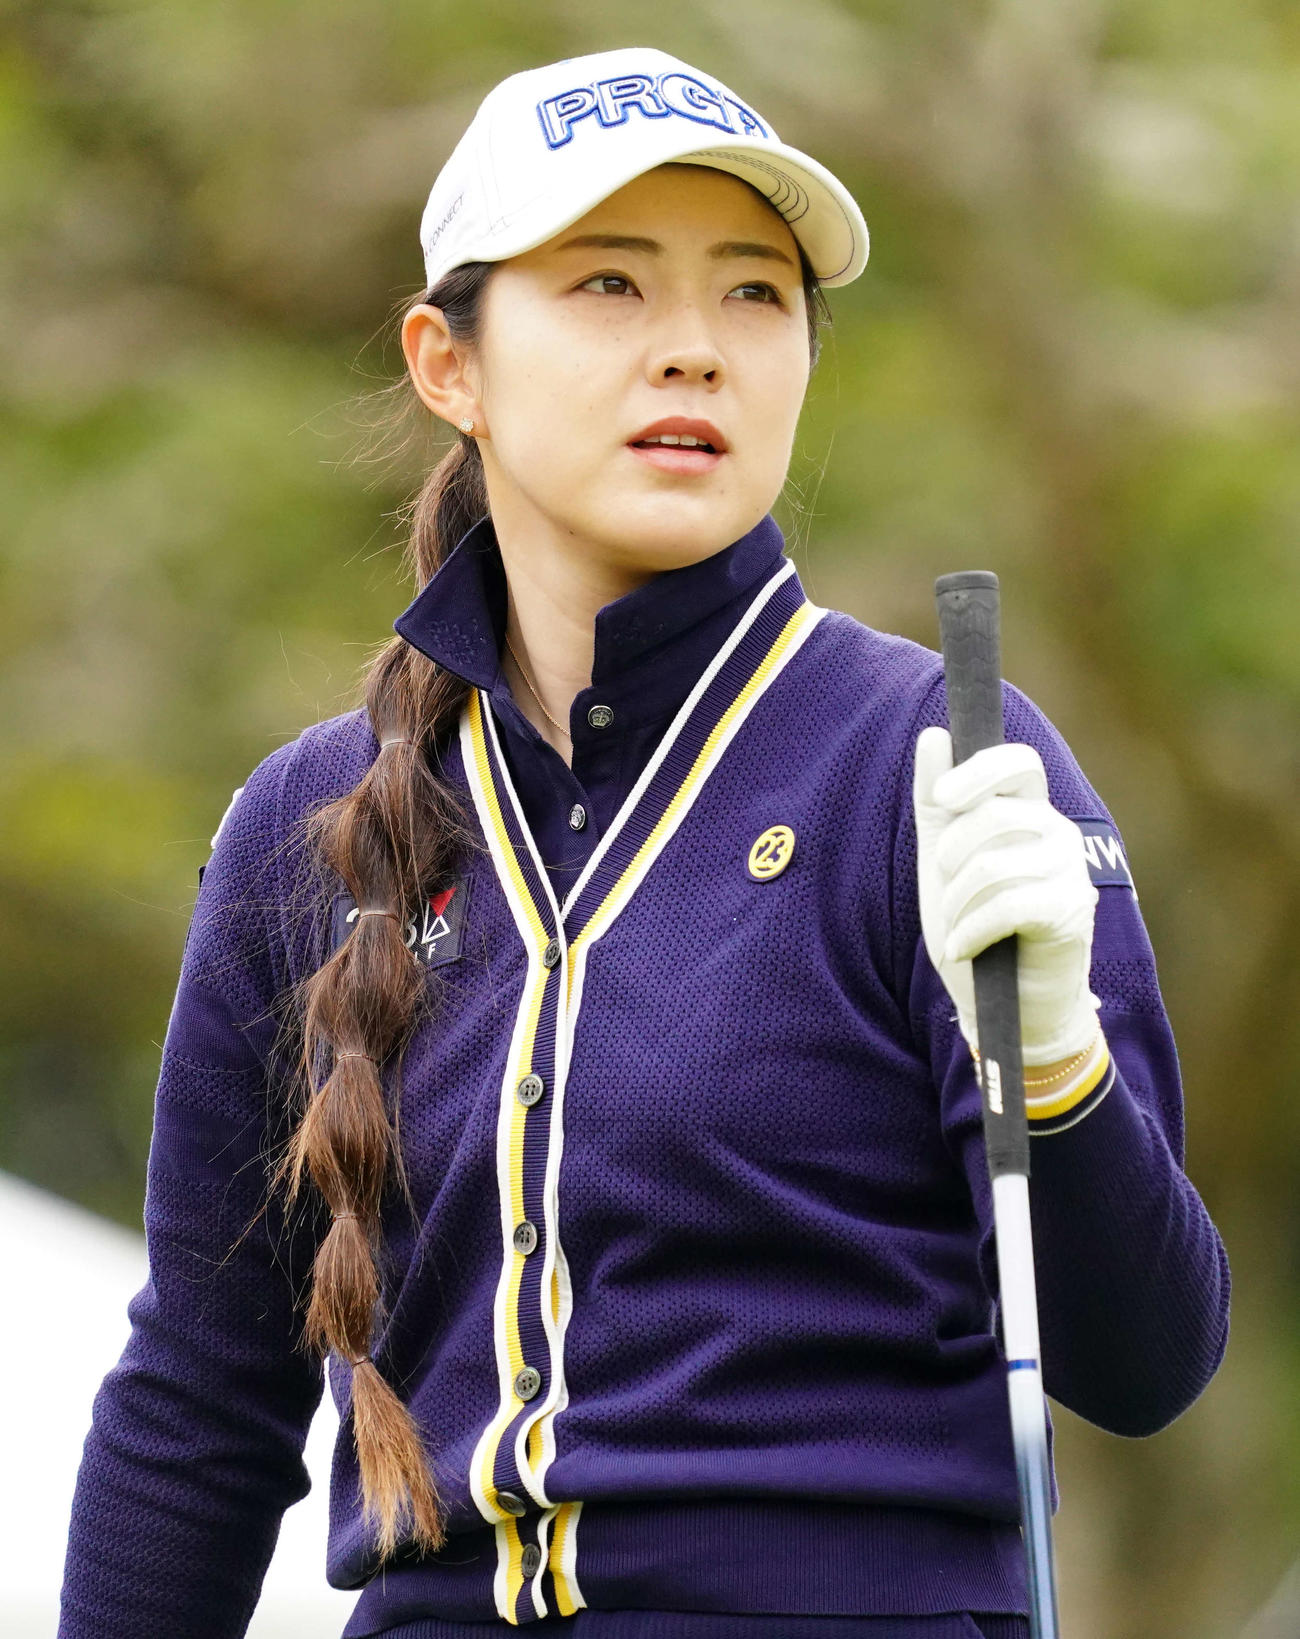 https://www.nikkansports.com/sports/golf/news/img/202104040000109-w1300_22.jpg